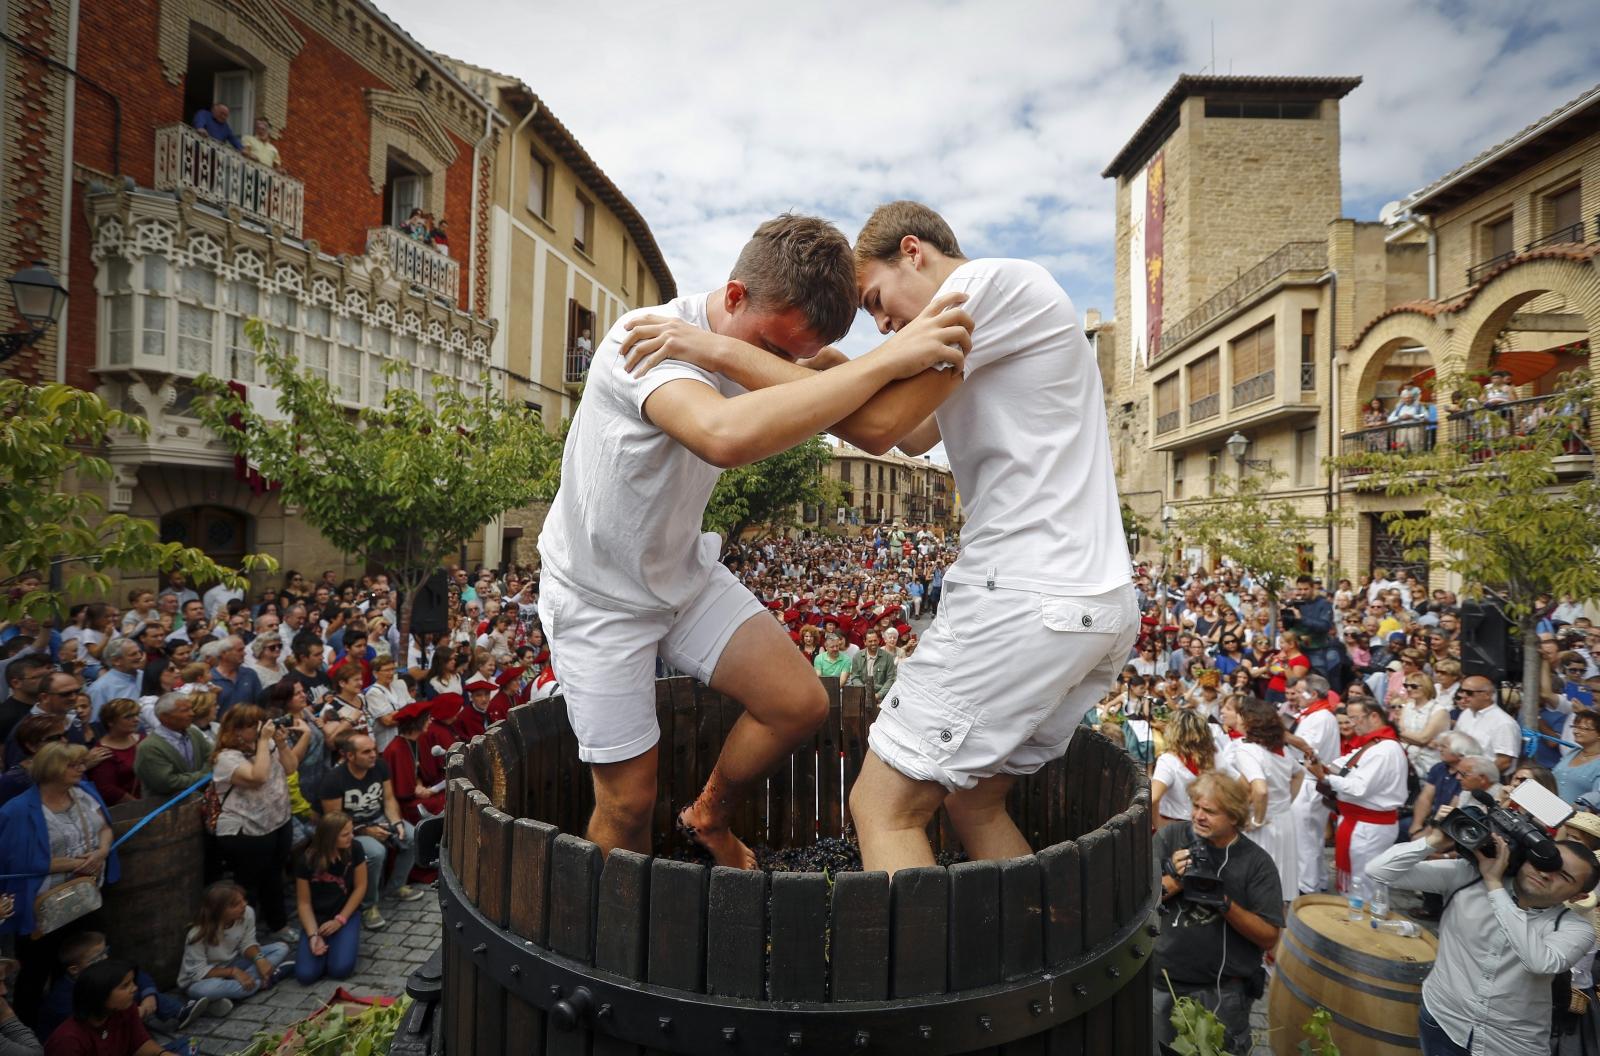 Hiszpania. Festiwal Wina  EPA/VILLAR LOPEZ